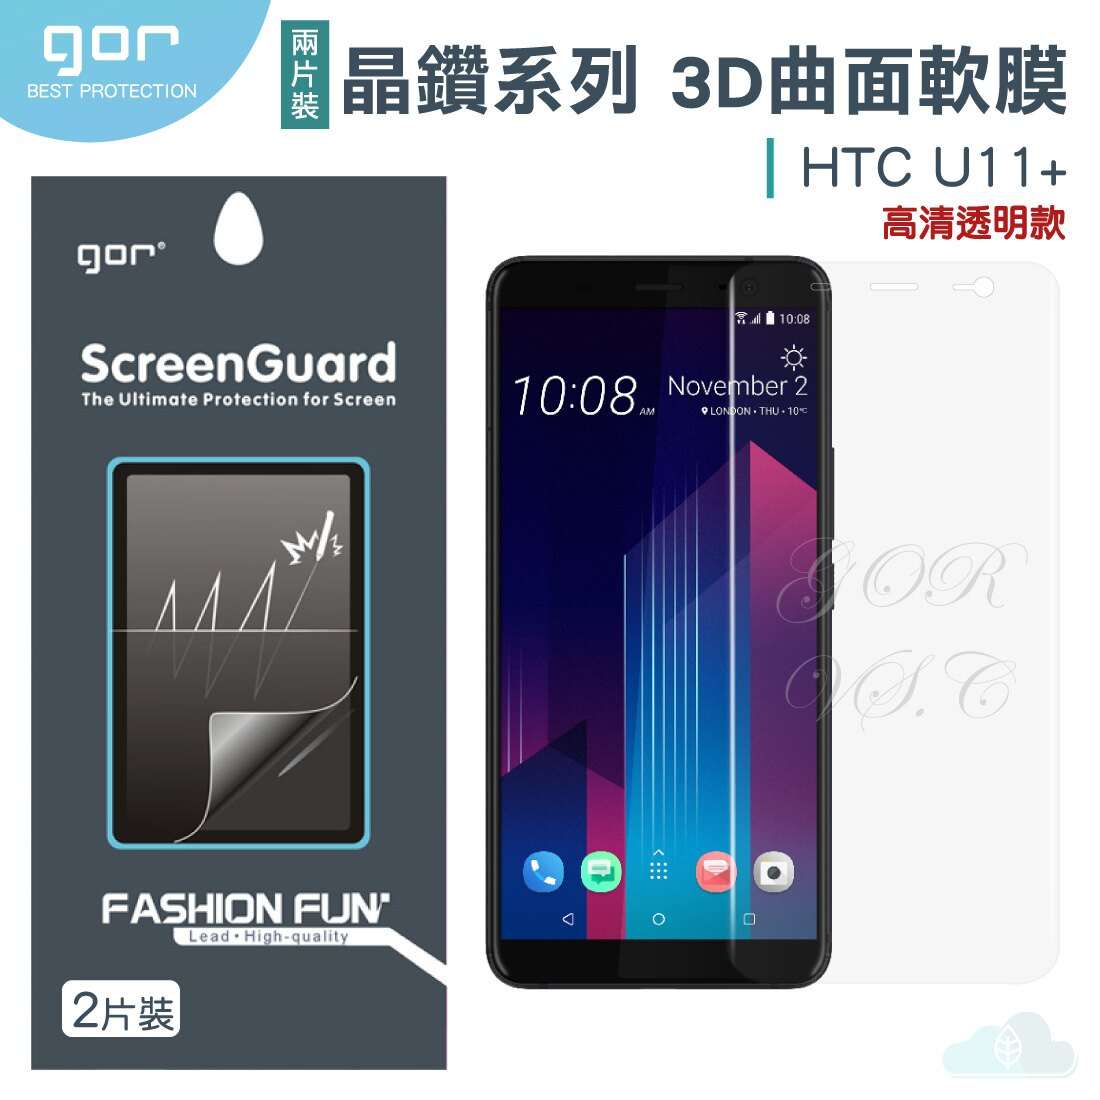 GOR HTC 晶鑽系列 宏達電 HTC U11+ 3D曲面 全滿版 高清 正膜 PET 軟膜 保護貼 全館消費滿299免運費